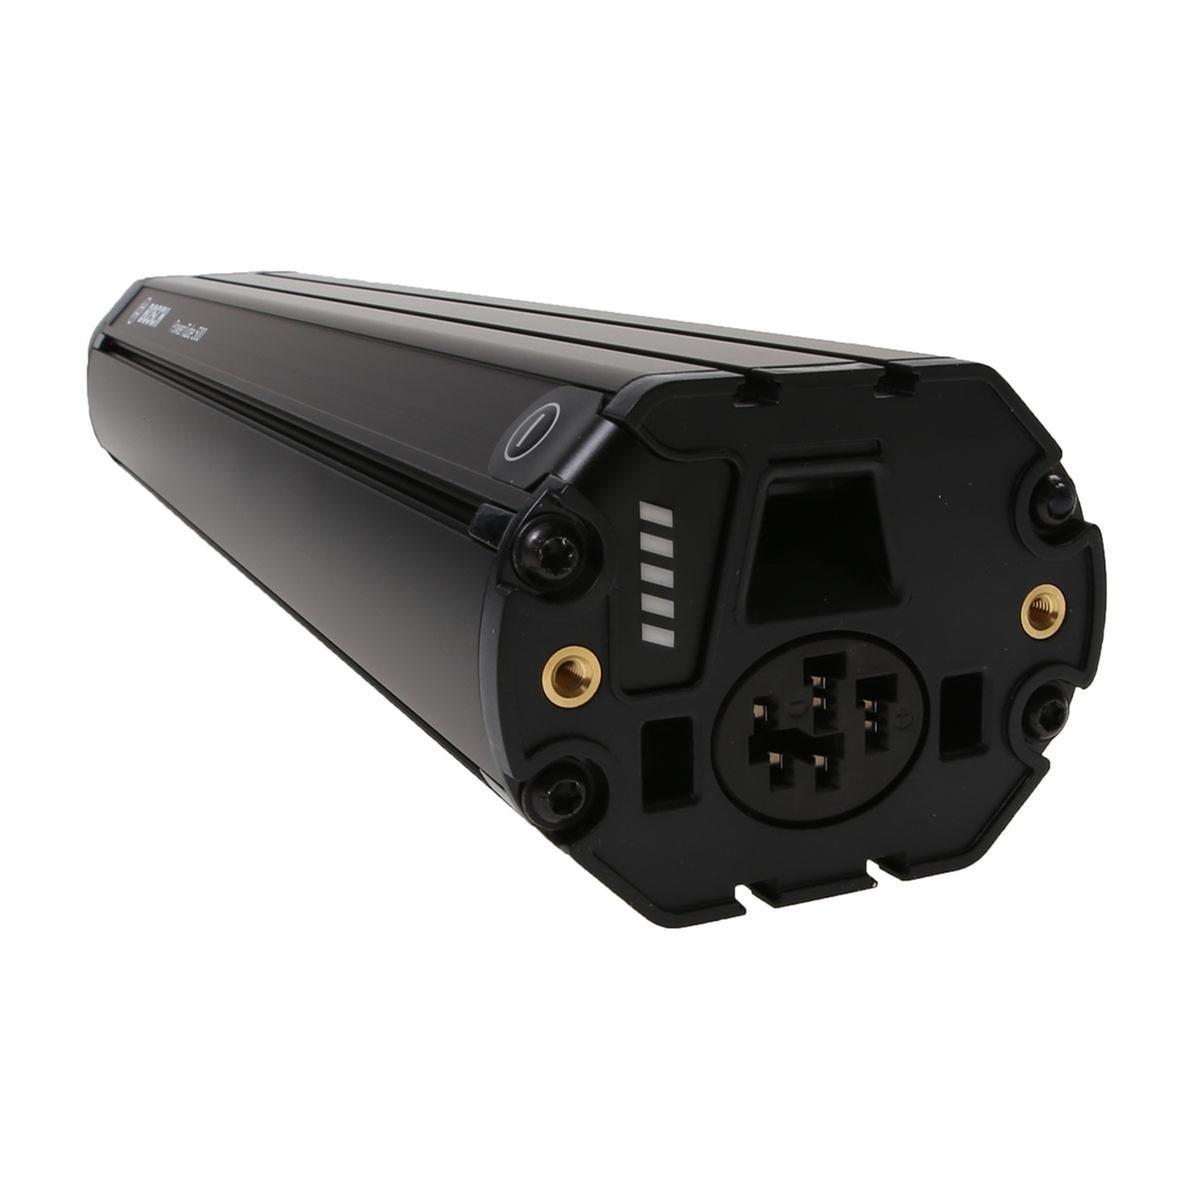 Baterie rámová BOSCH PowerTube 500 Wh/13,9 Ah horizontal 0275007539